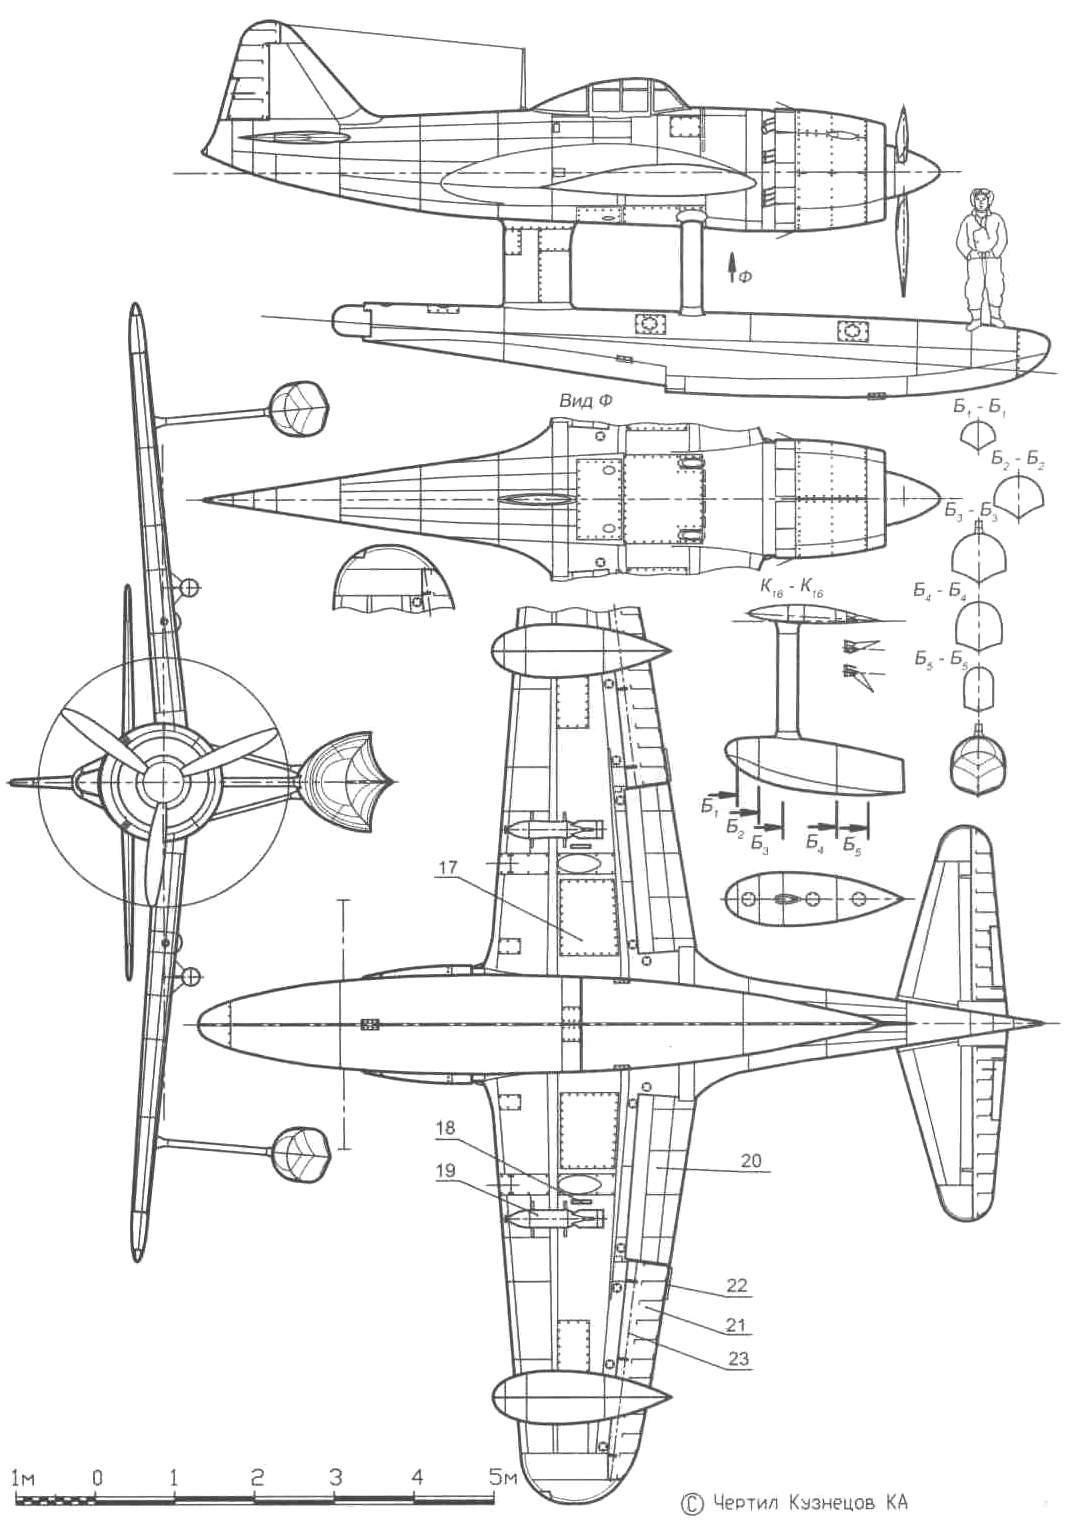 Гидроистребитель Kawanishi N1K1 Kyofu (Rex)